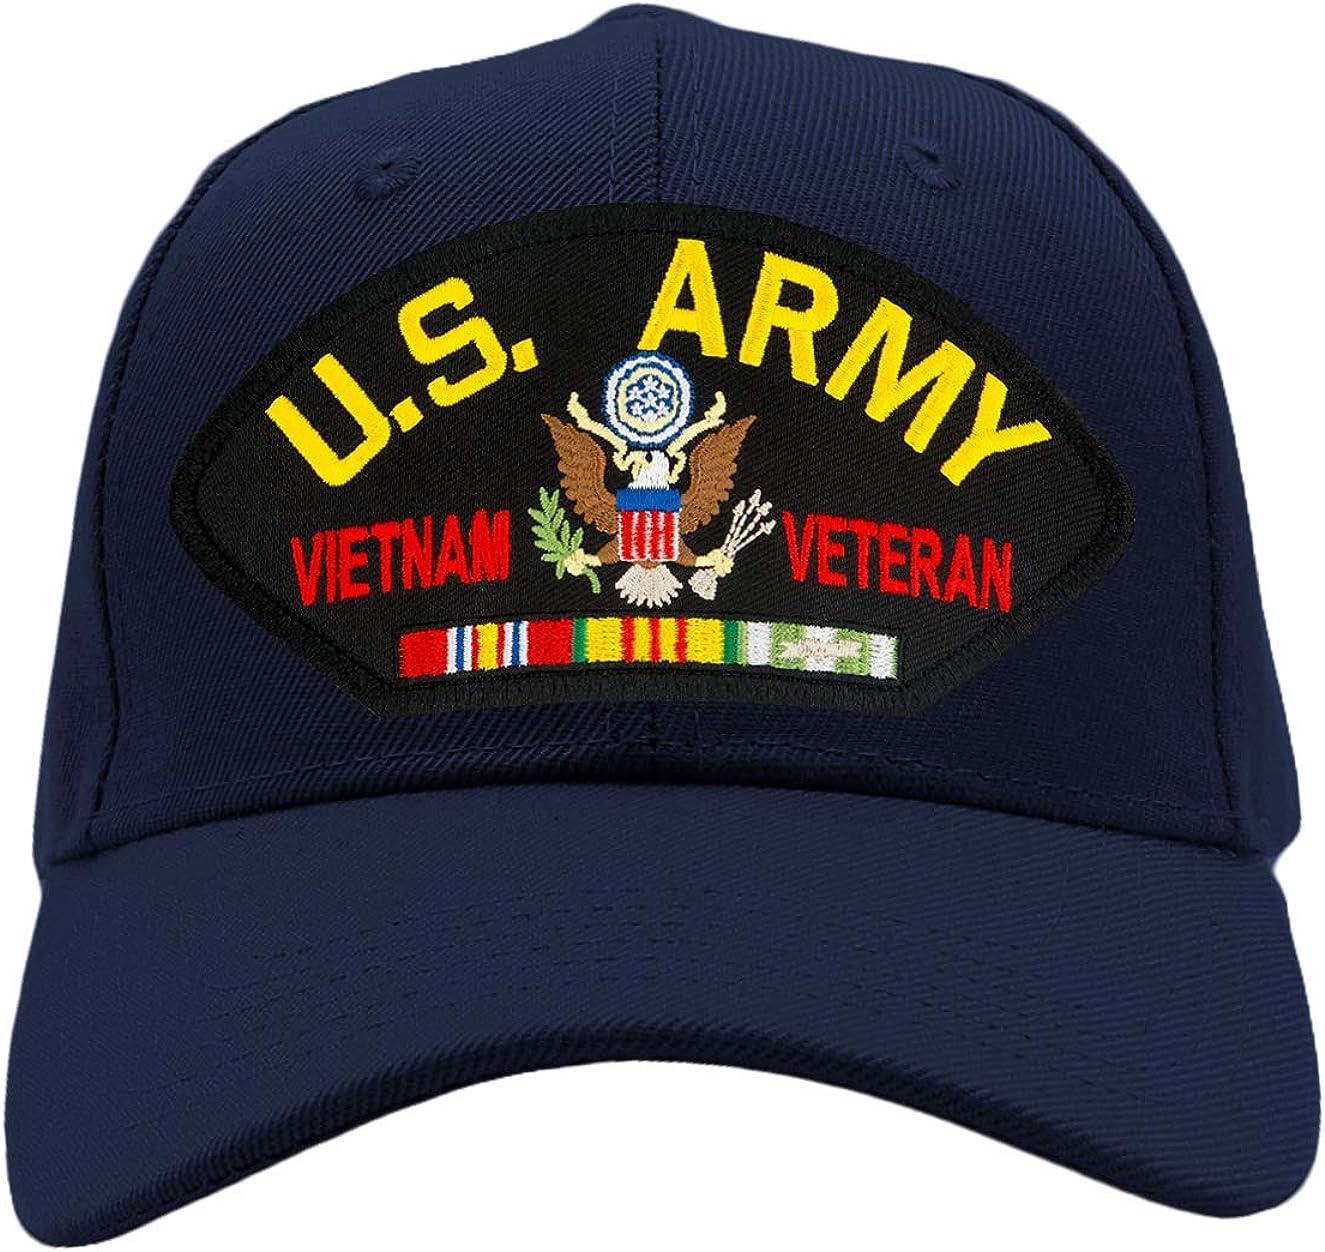 PATCHTOWN US Army - Vietnam...